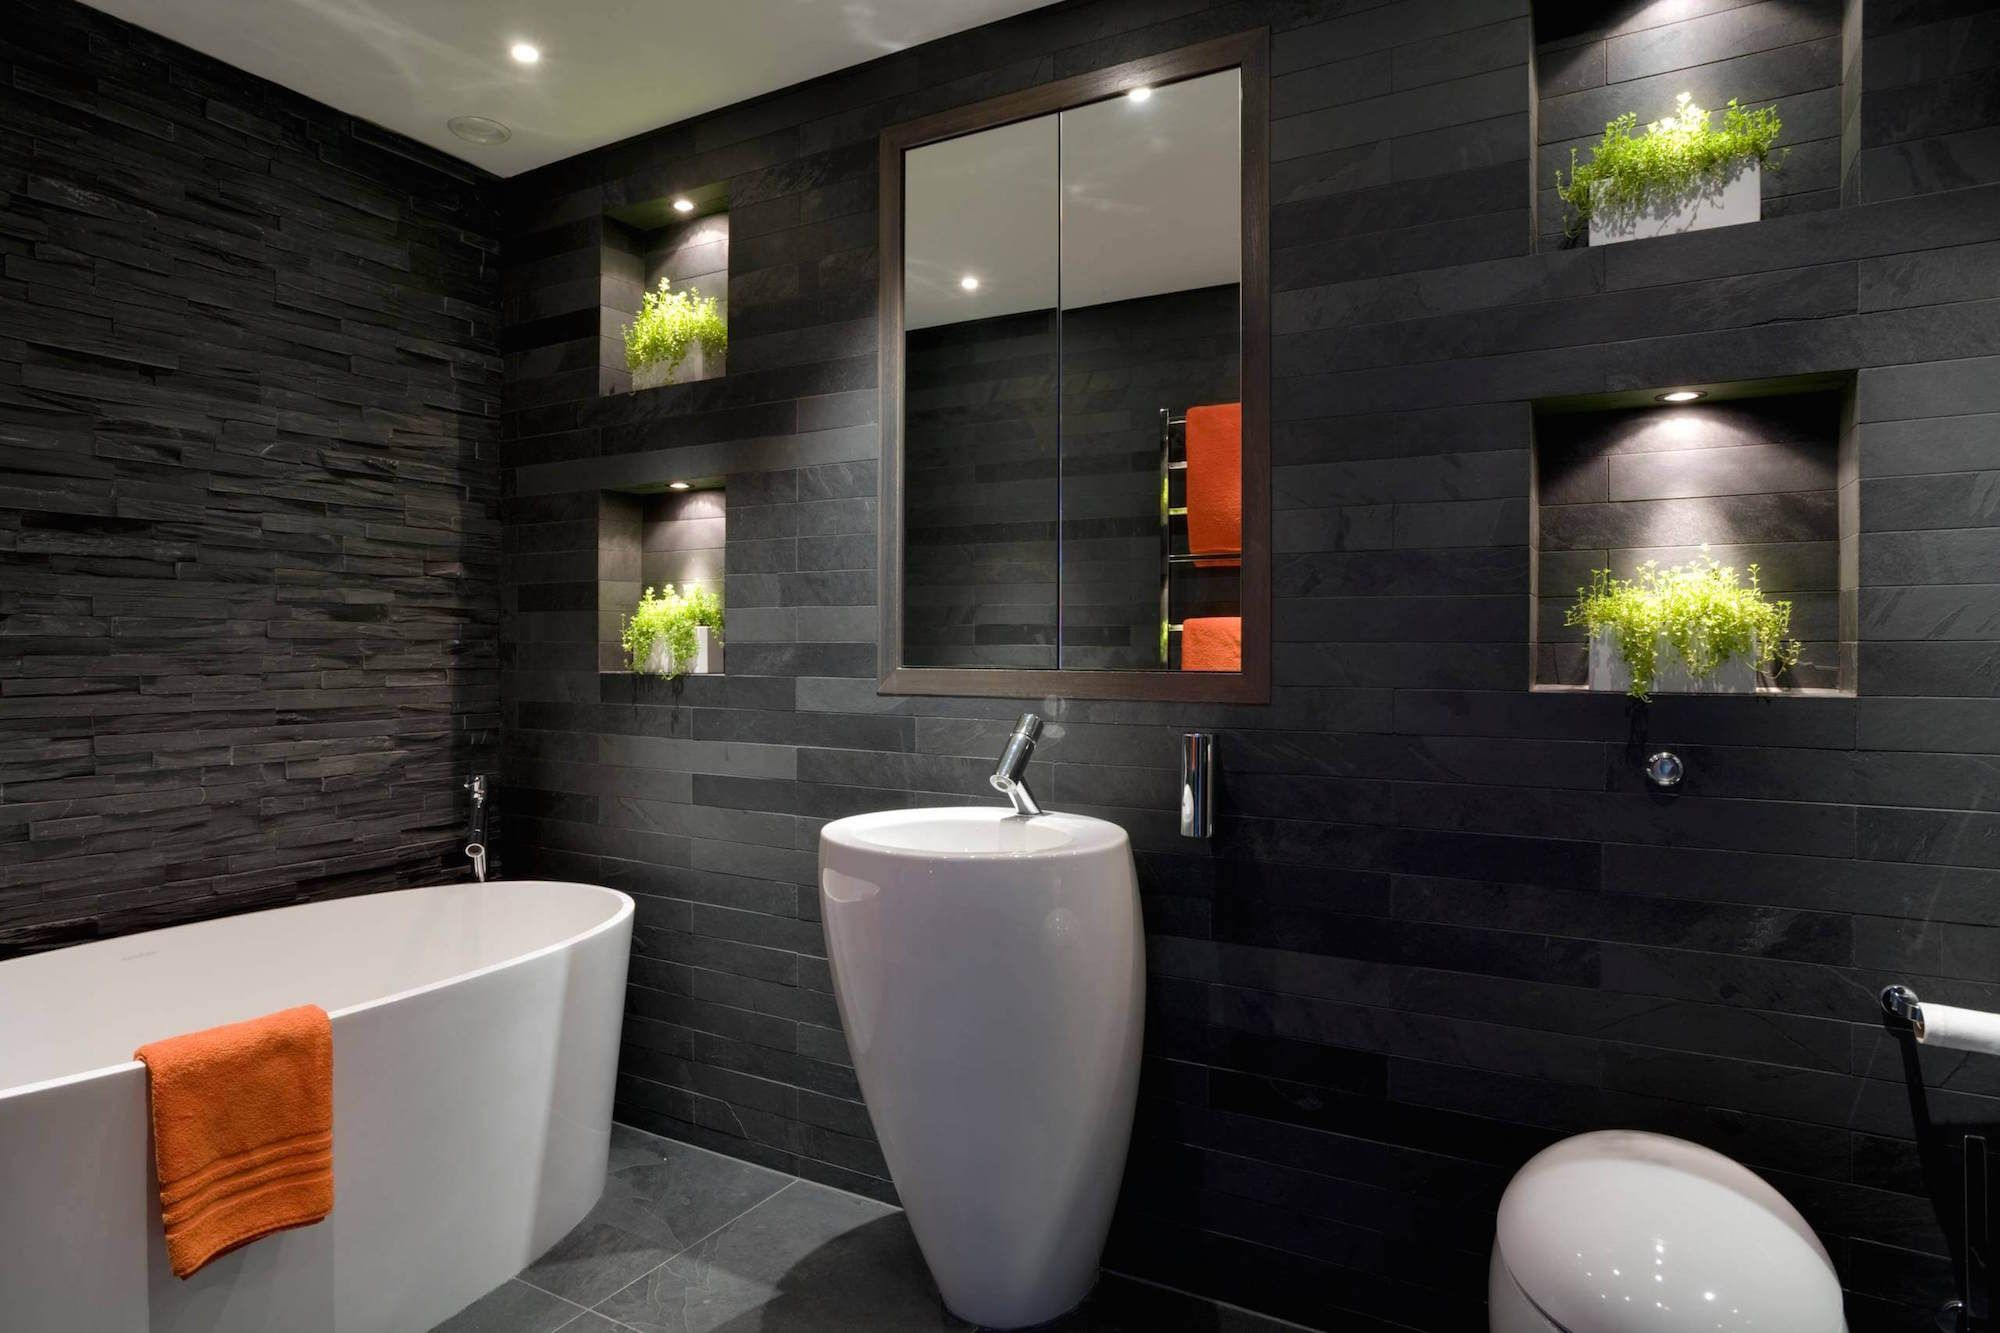 Дизайн ванной комнаты черных тонах